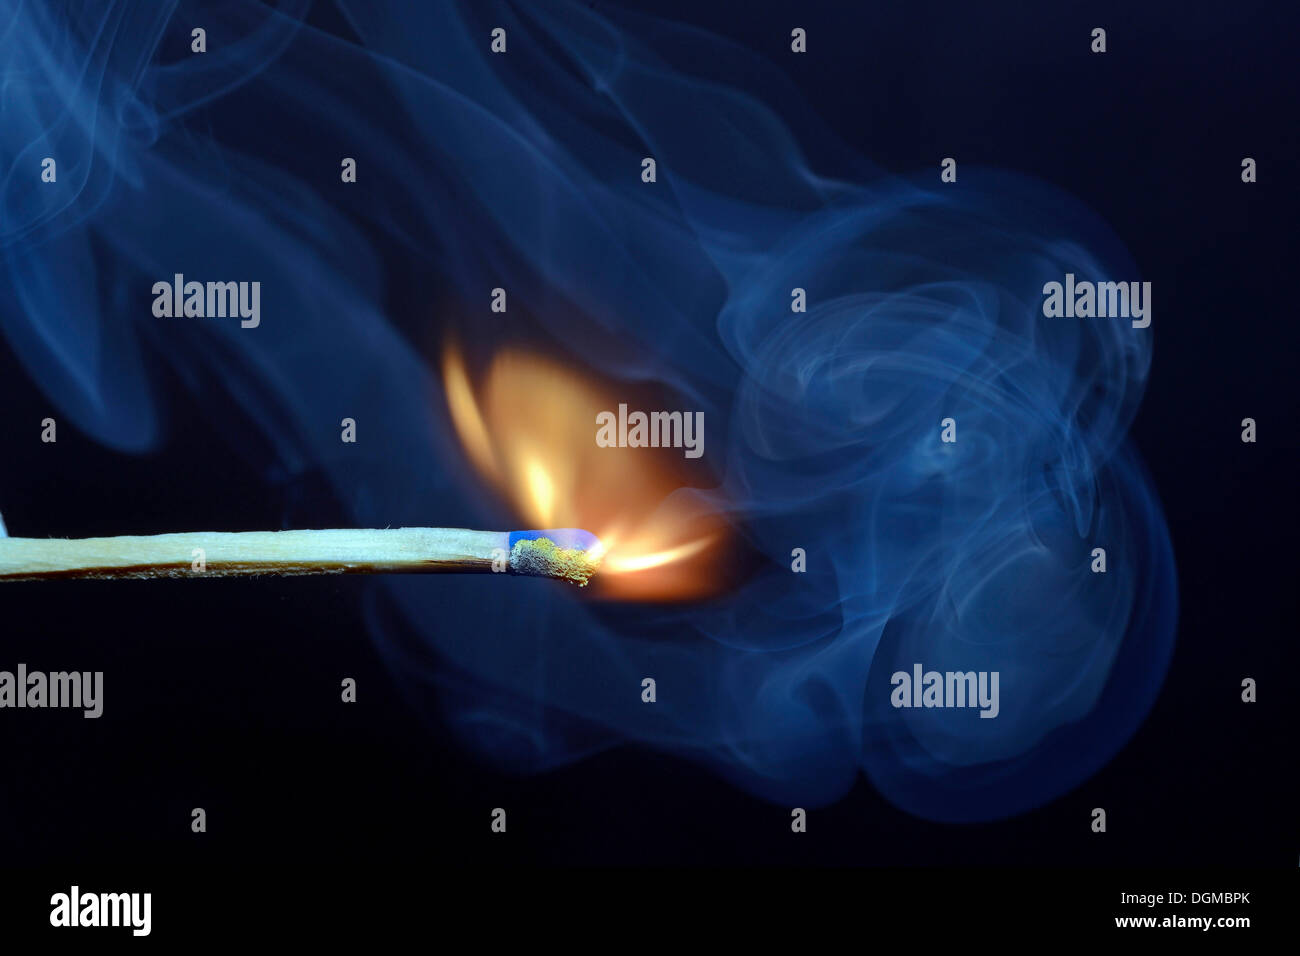 Match being lit, blue smoke - Stock Image